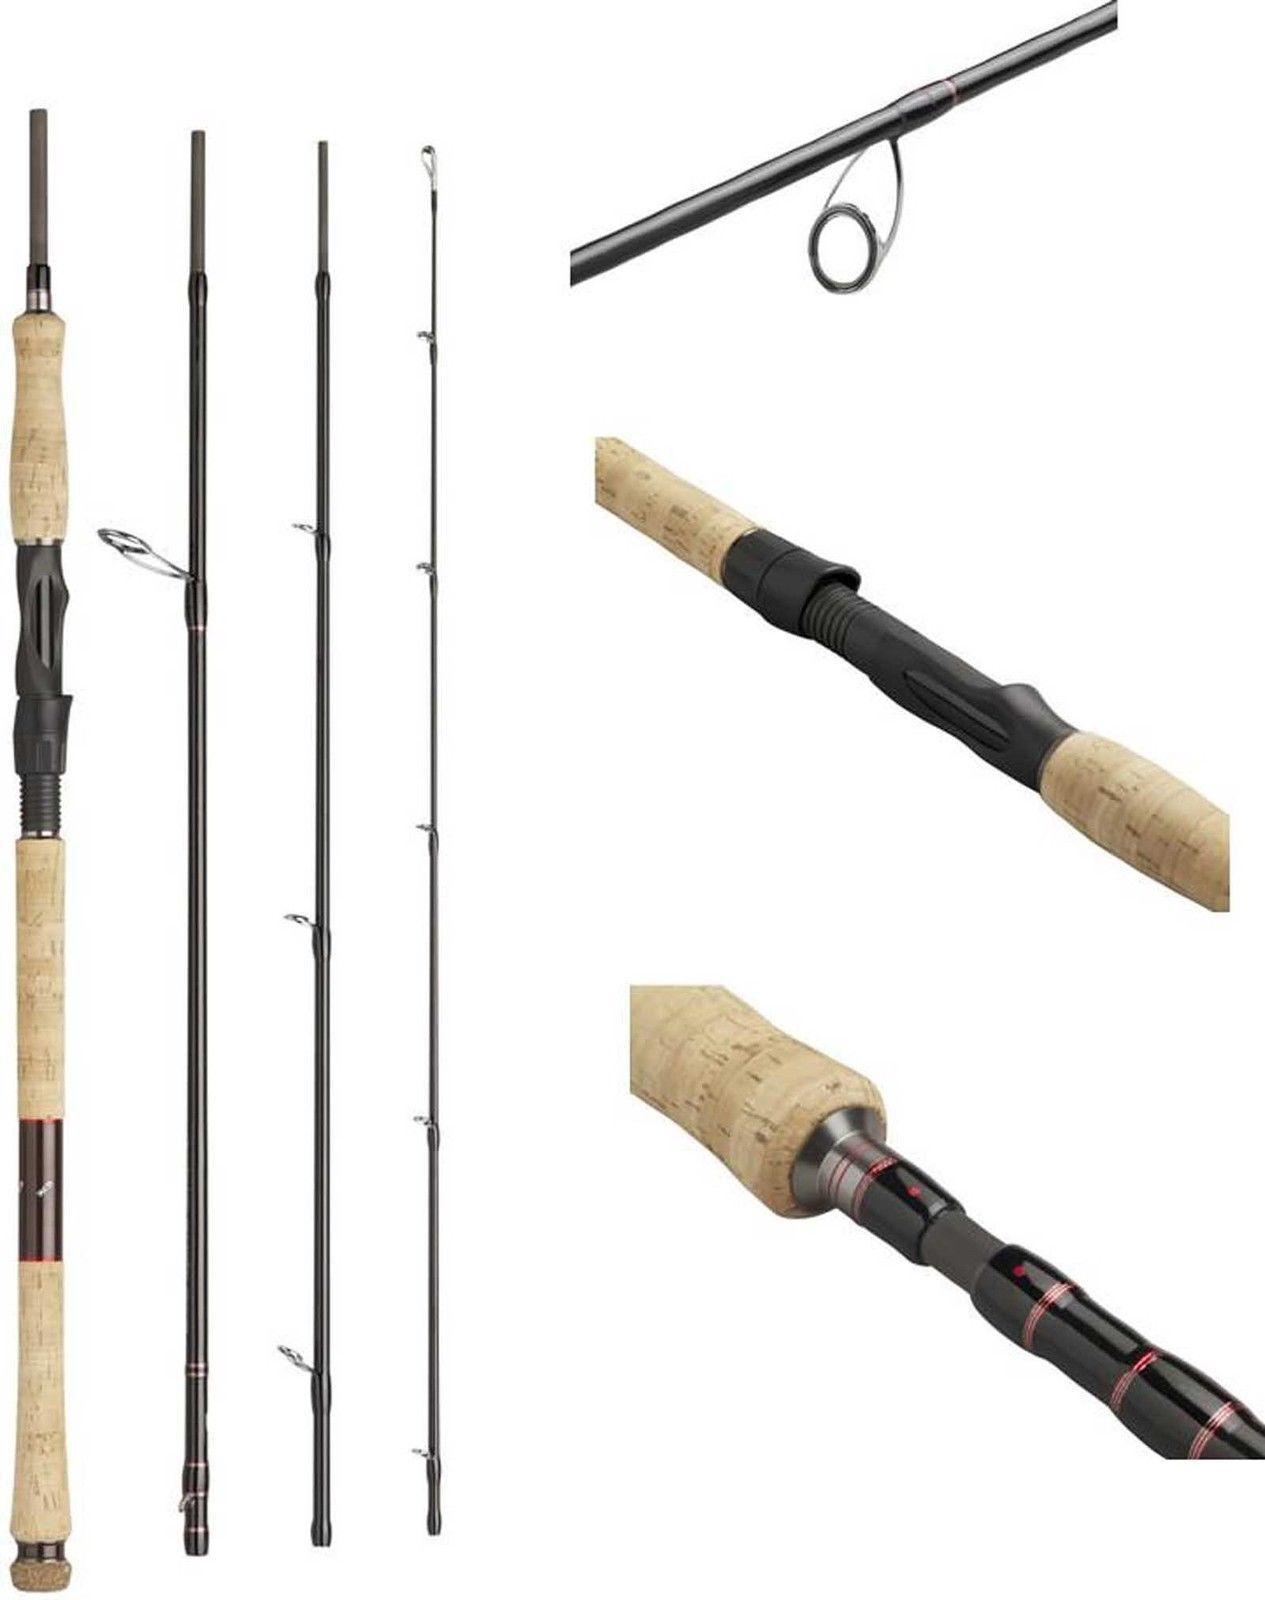 BN Superb Modern Berkley 904H 9ft 19 49g Pulse Travel XCD Spinning Fishing Rod